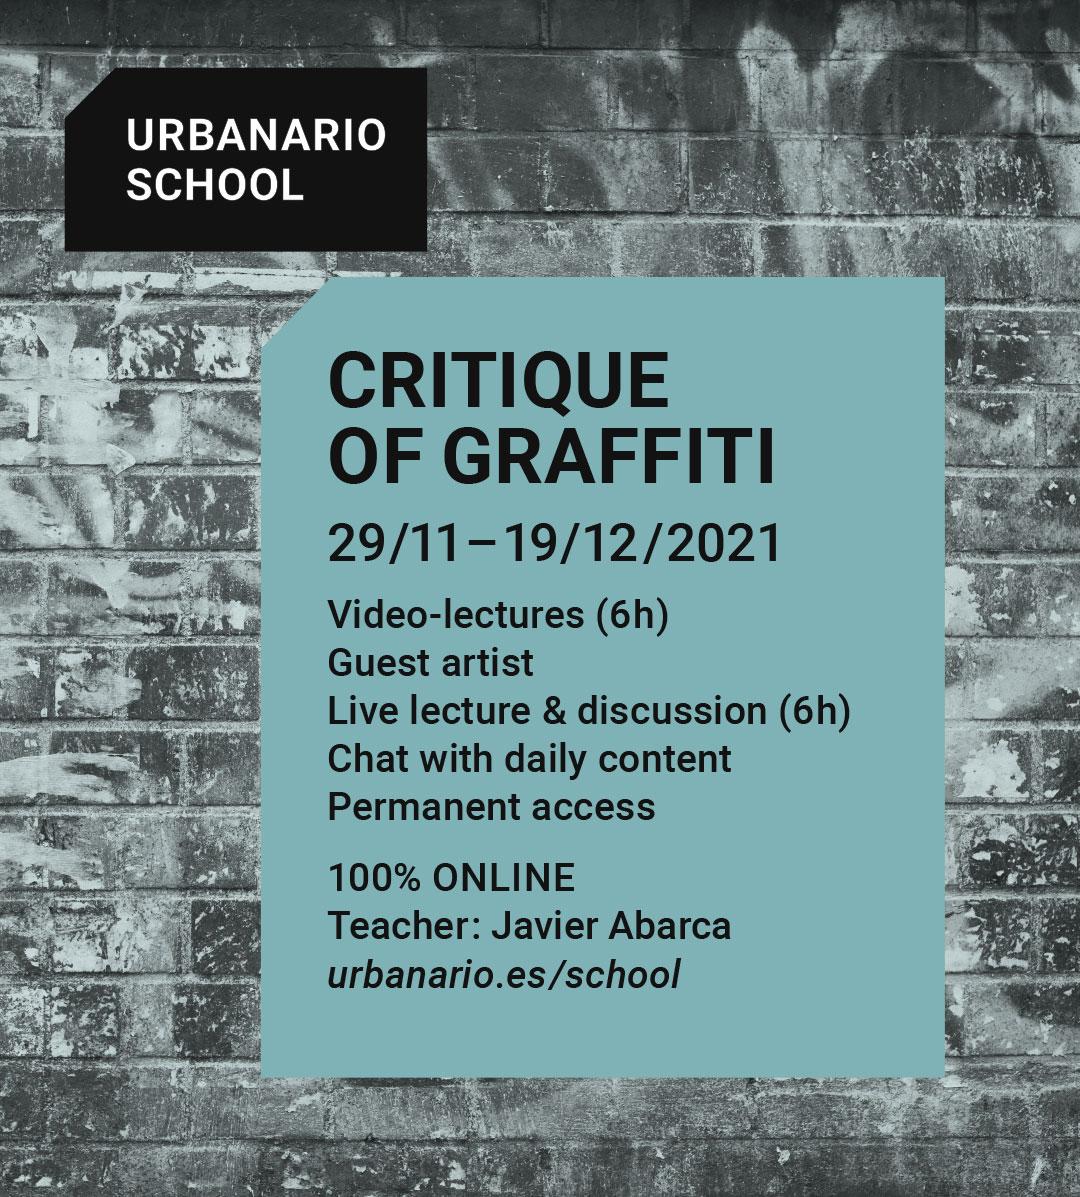 Critique of graffiti - Urbanario School